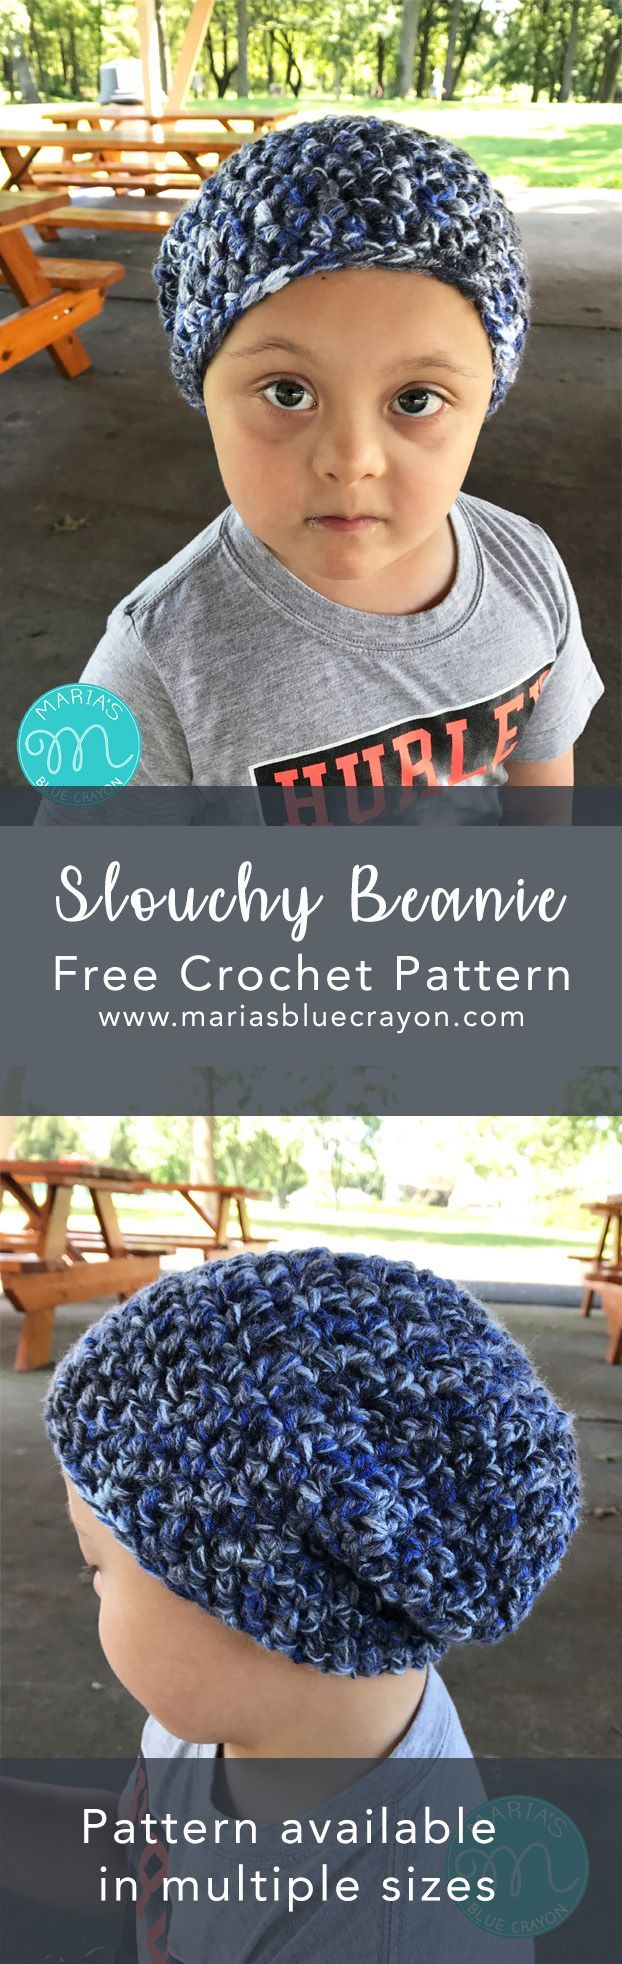 Crochet Slouchy Beanie | Free Crochet Pattern | Basic Beginner Stitches